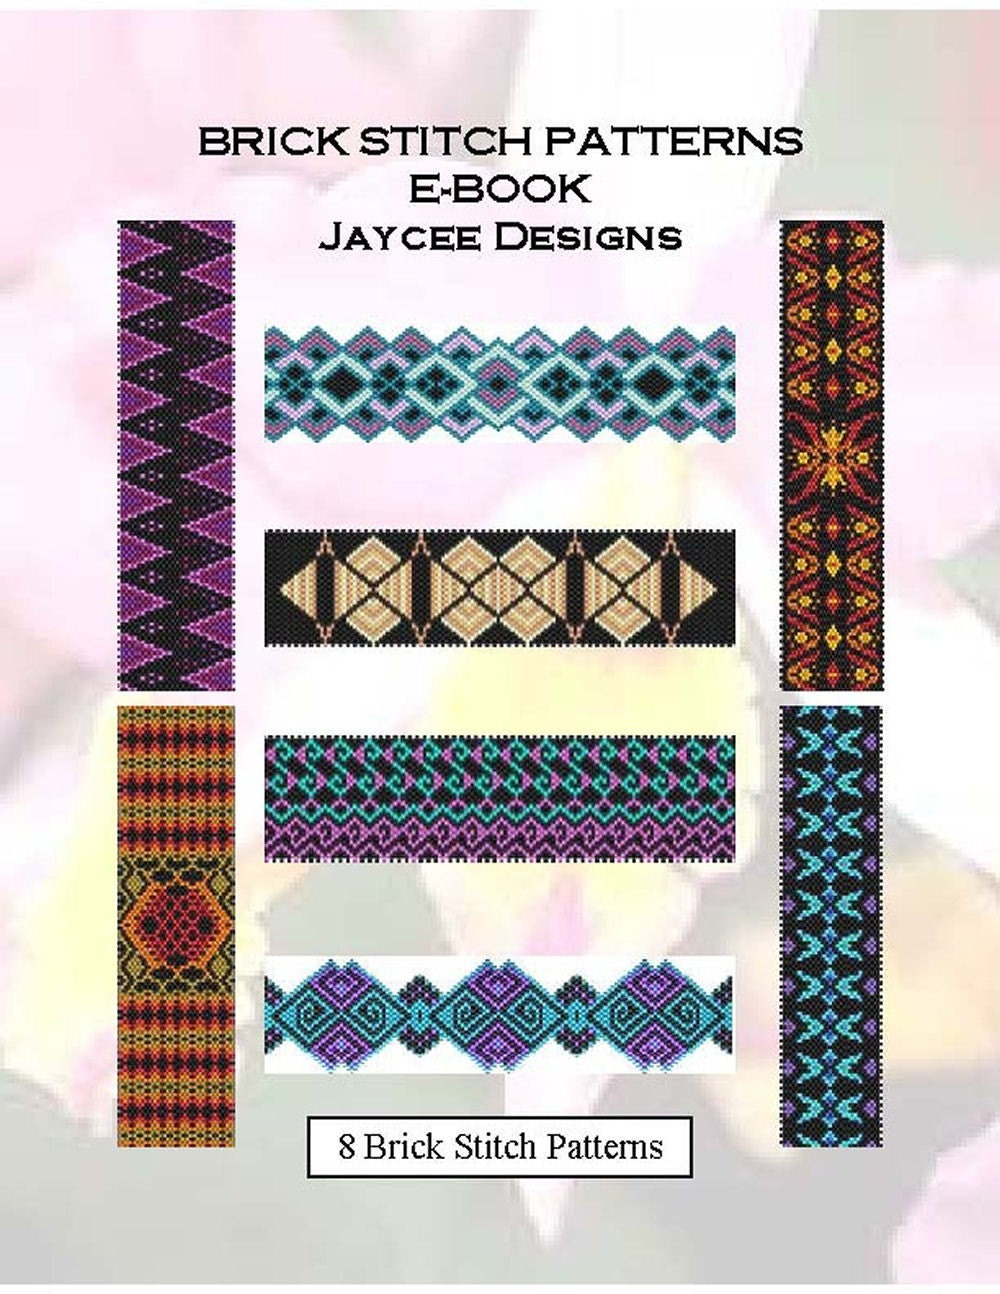 Brick Stitch Patterns Ebook